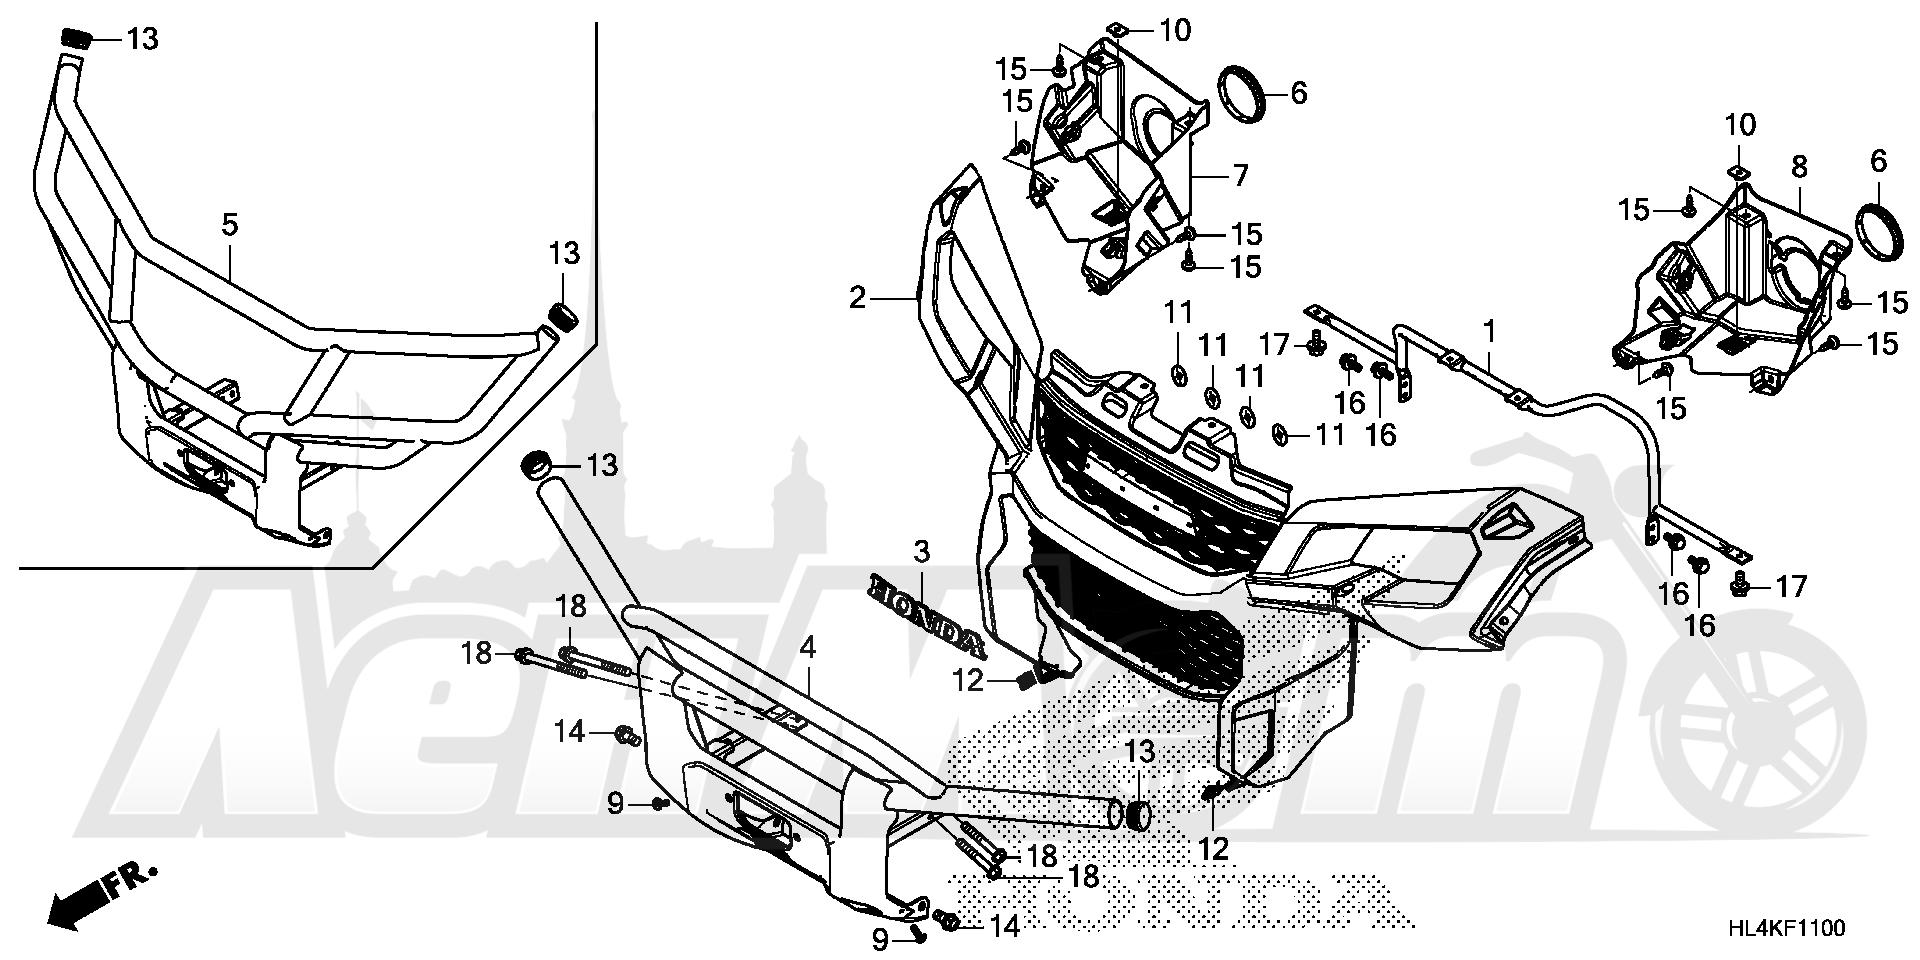 Запчасти для Квадроцикла Honda 2019 SXS1000M3L Раздел: FRONT GRILLE AND FRONT BUMPER | перед GRILLE и перед бампер